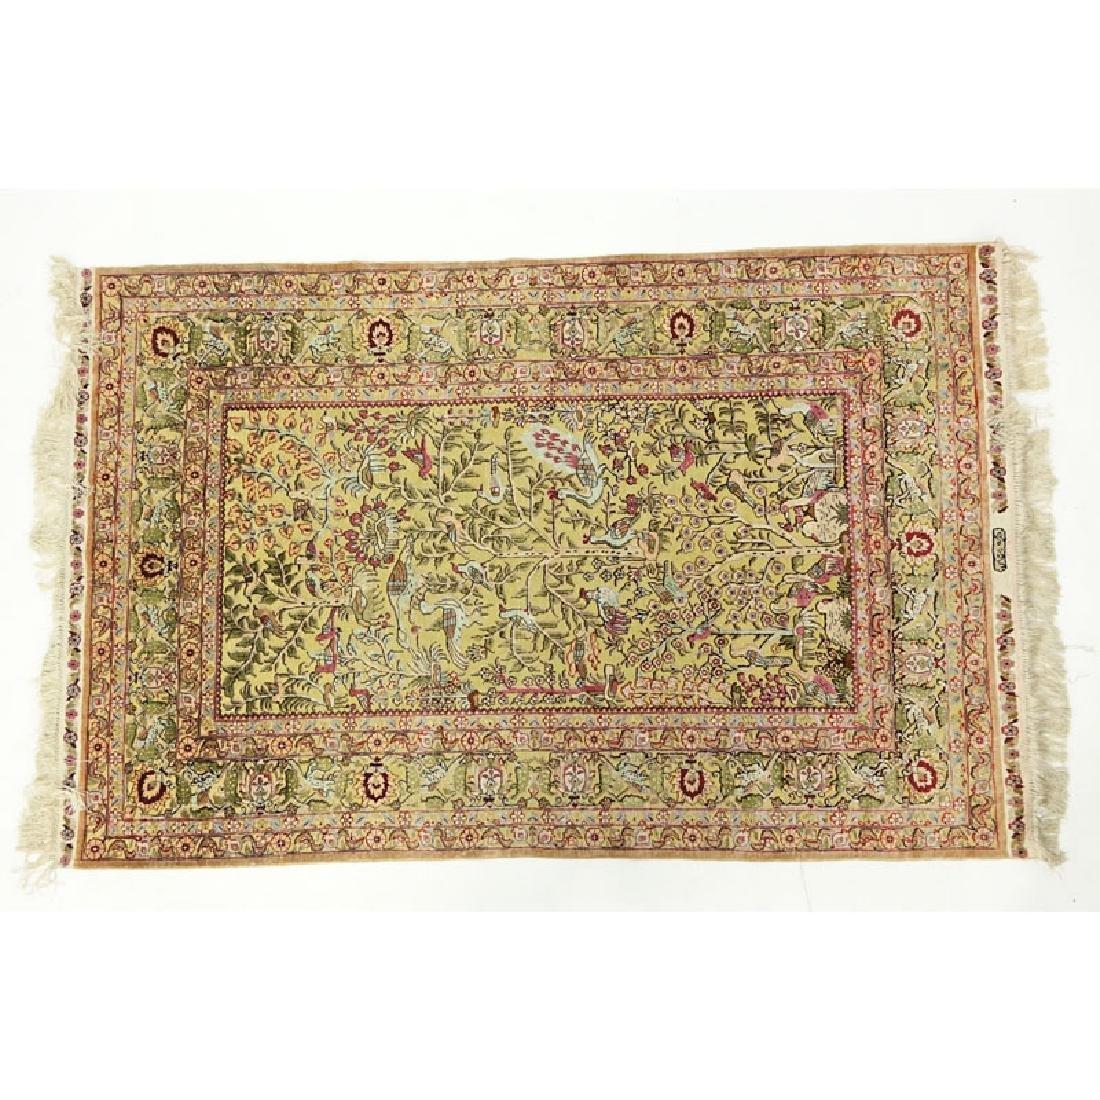 Semi Antique Gilt Persian Silk Rug.